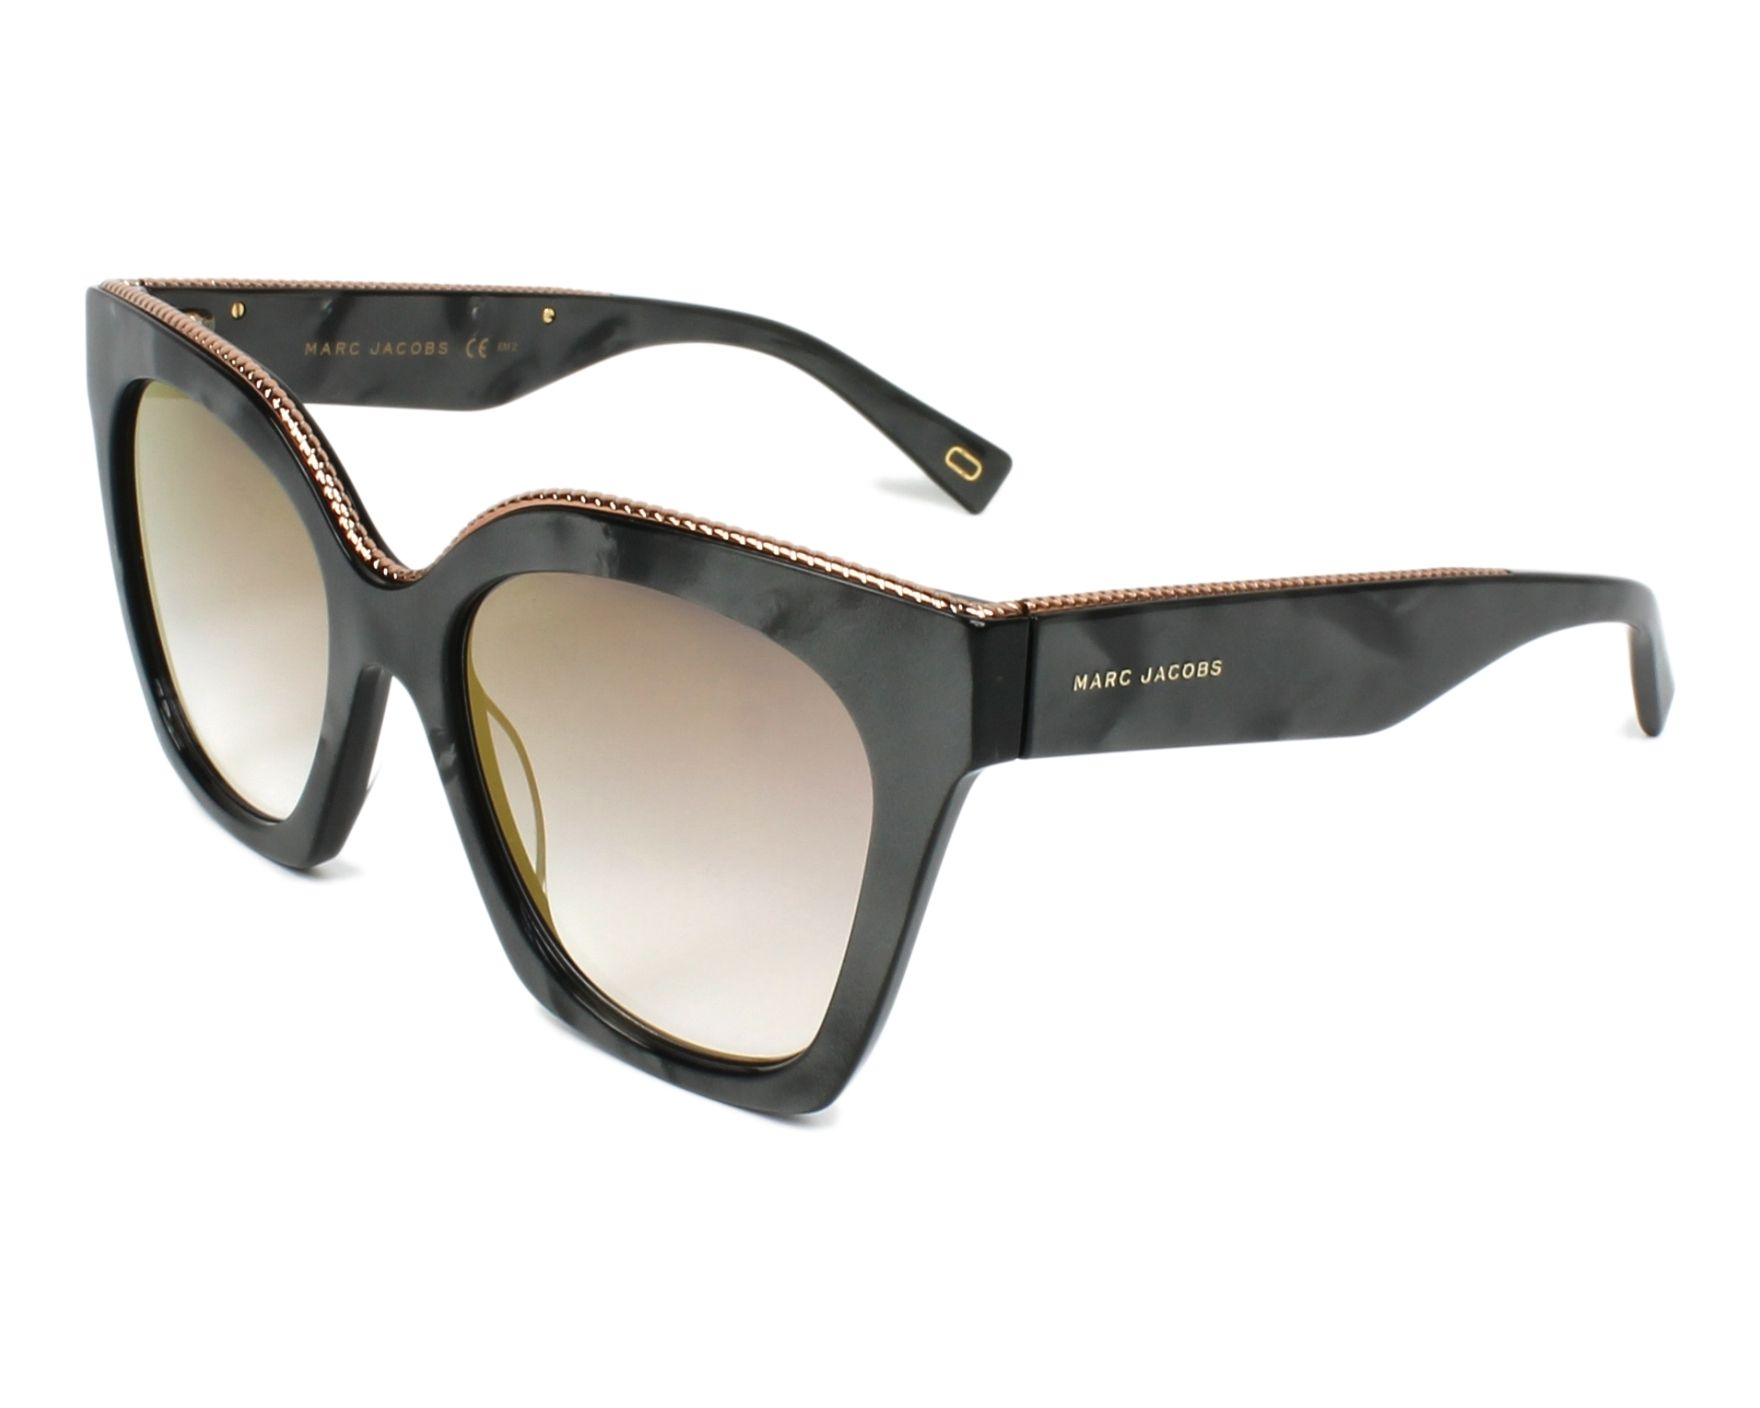 c46813cb2eca2 Sunglasses Marc Jacobs MARC-162-S C8W FQ 52-19 Grey Gold